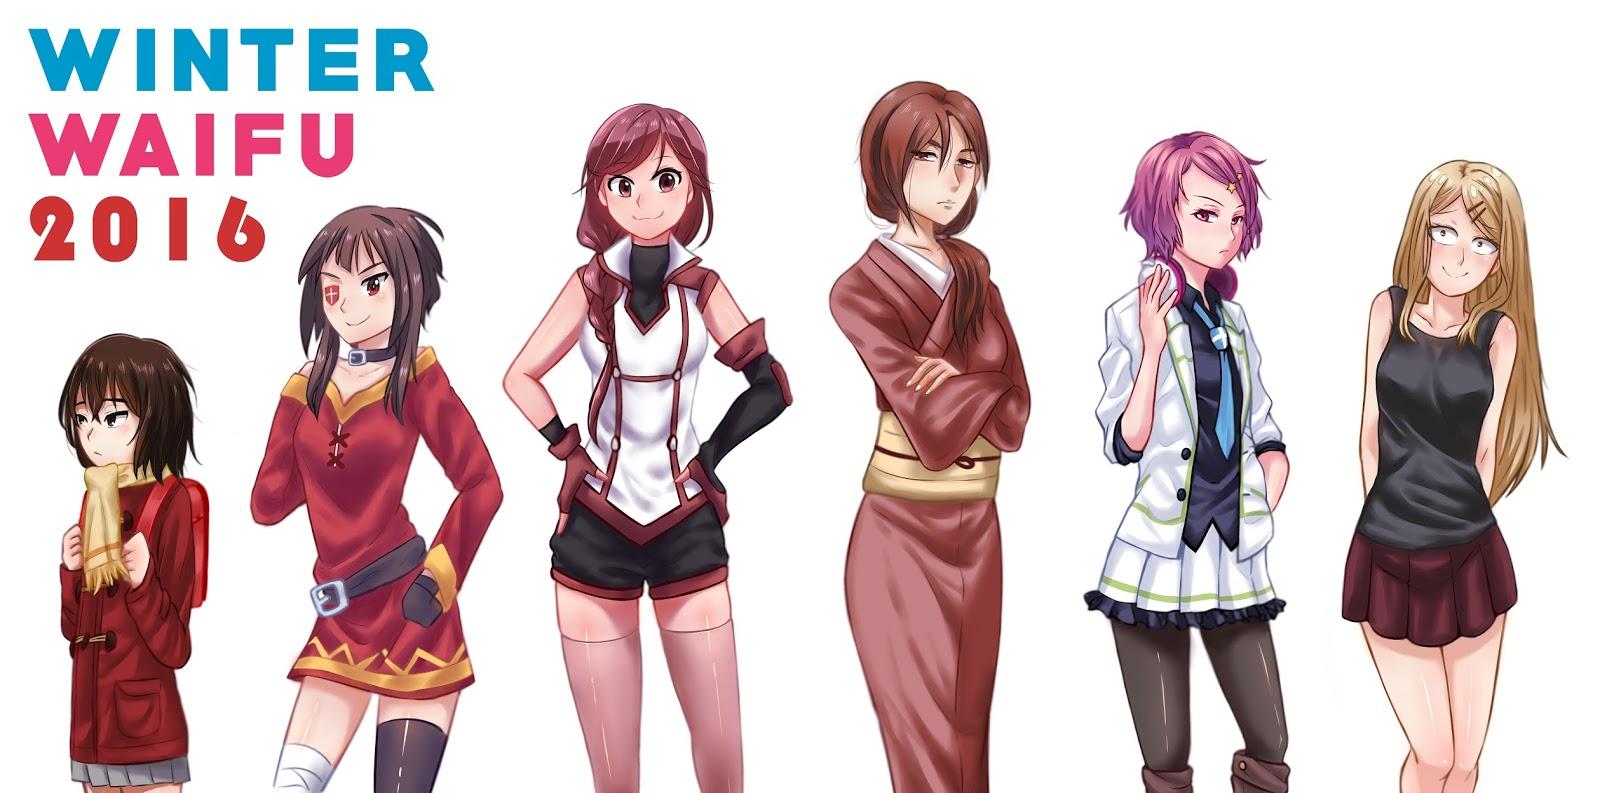 OTAKU CLUB Winter Anime 2016 Best Girls